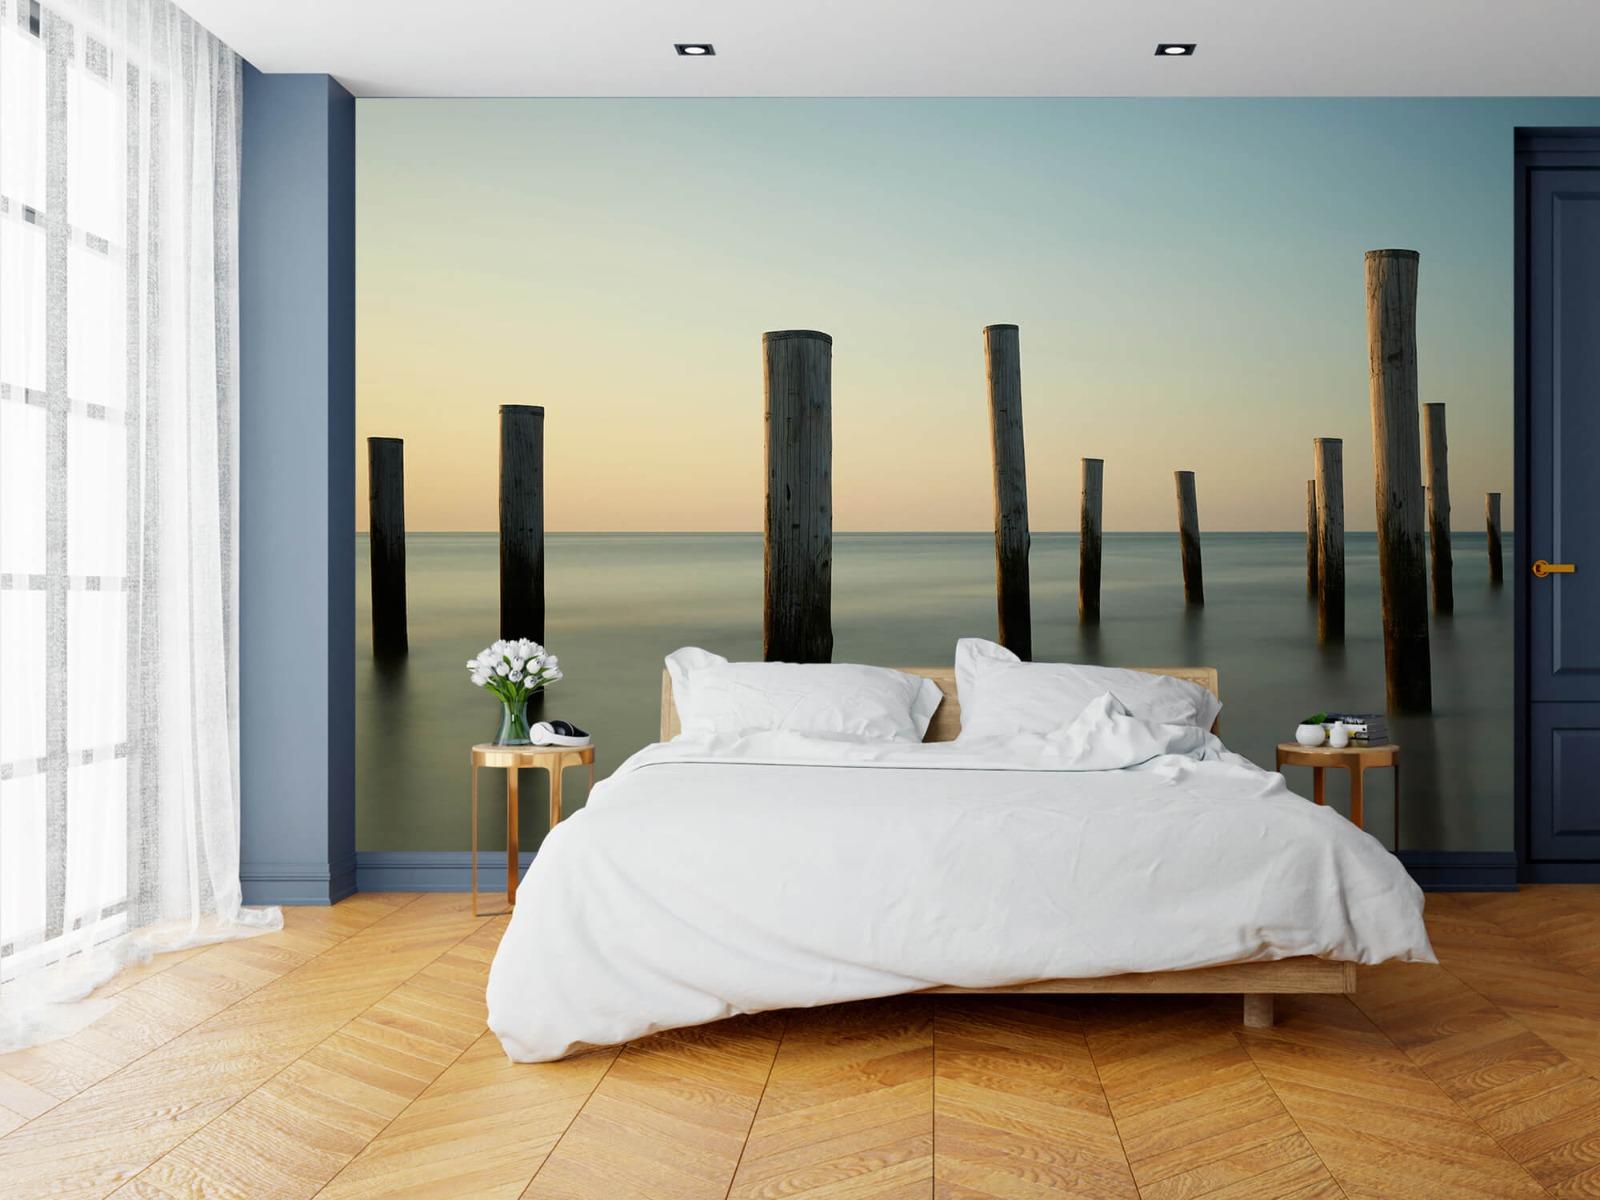 Zeeën en Oceanen - Houten strandpalen - Slaapkamer 3